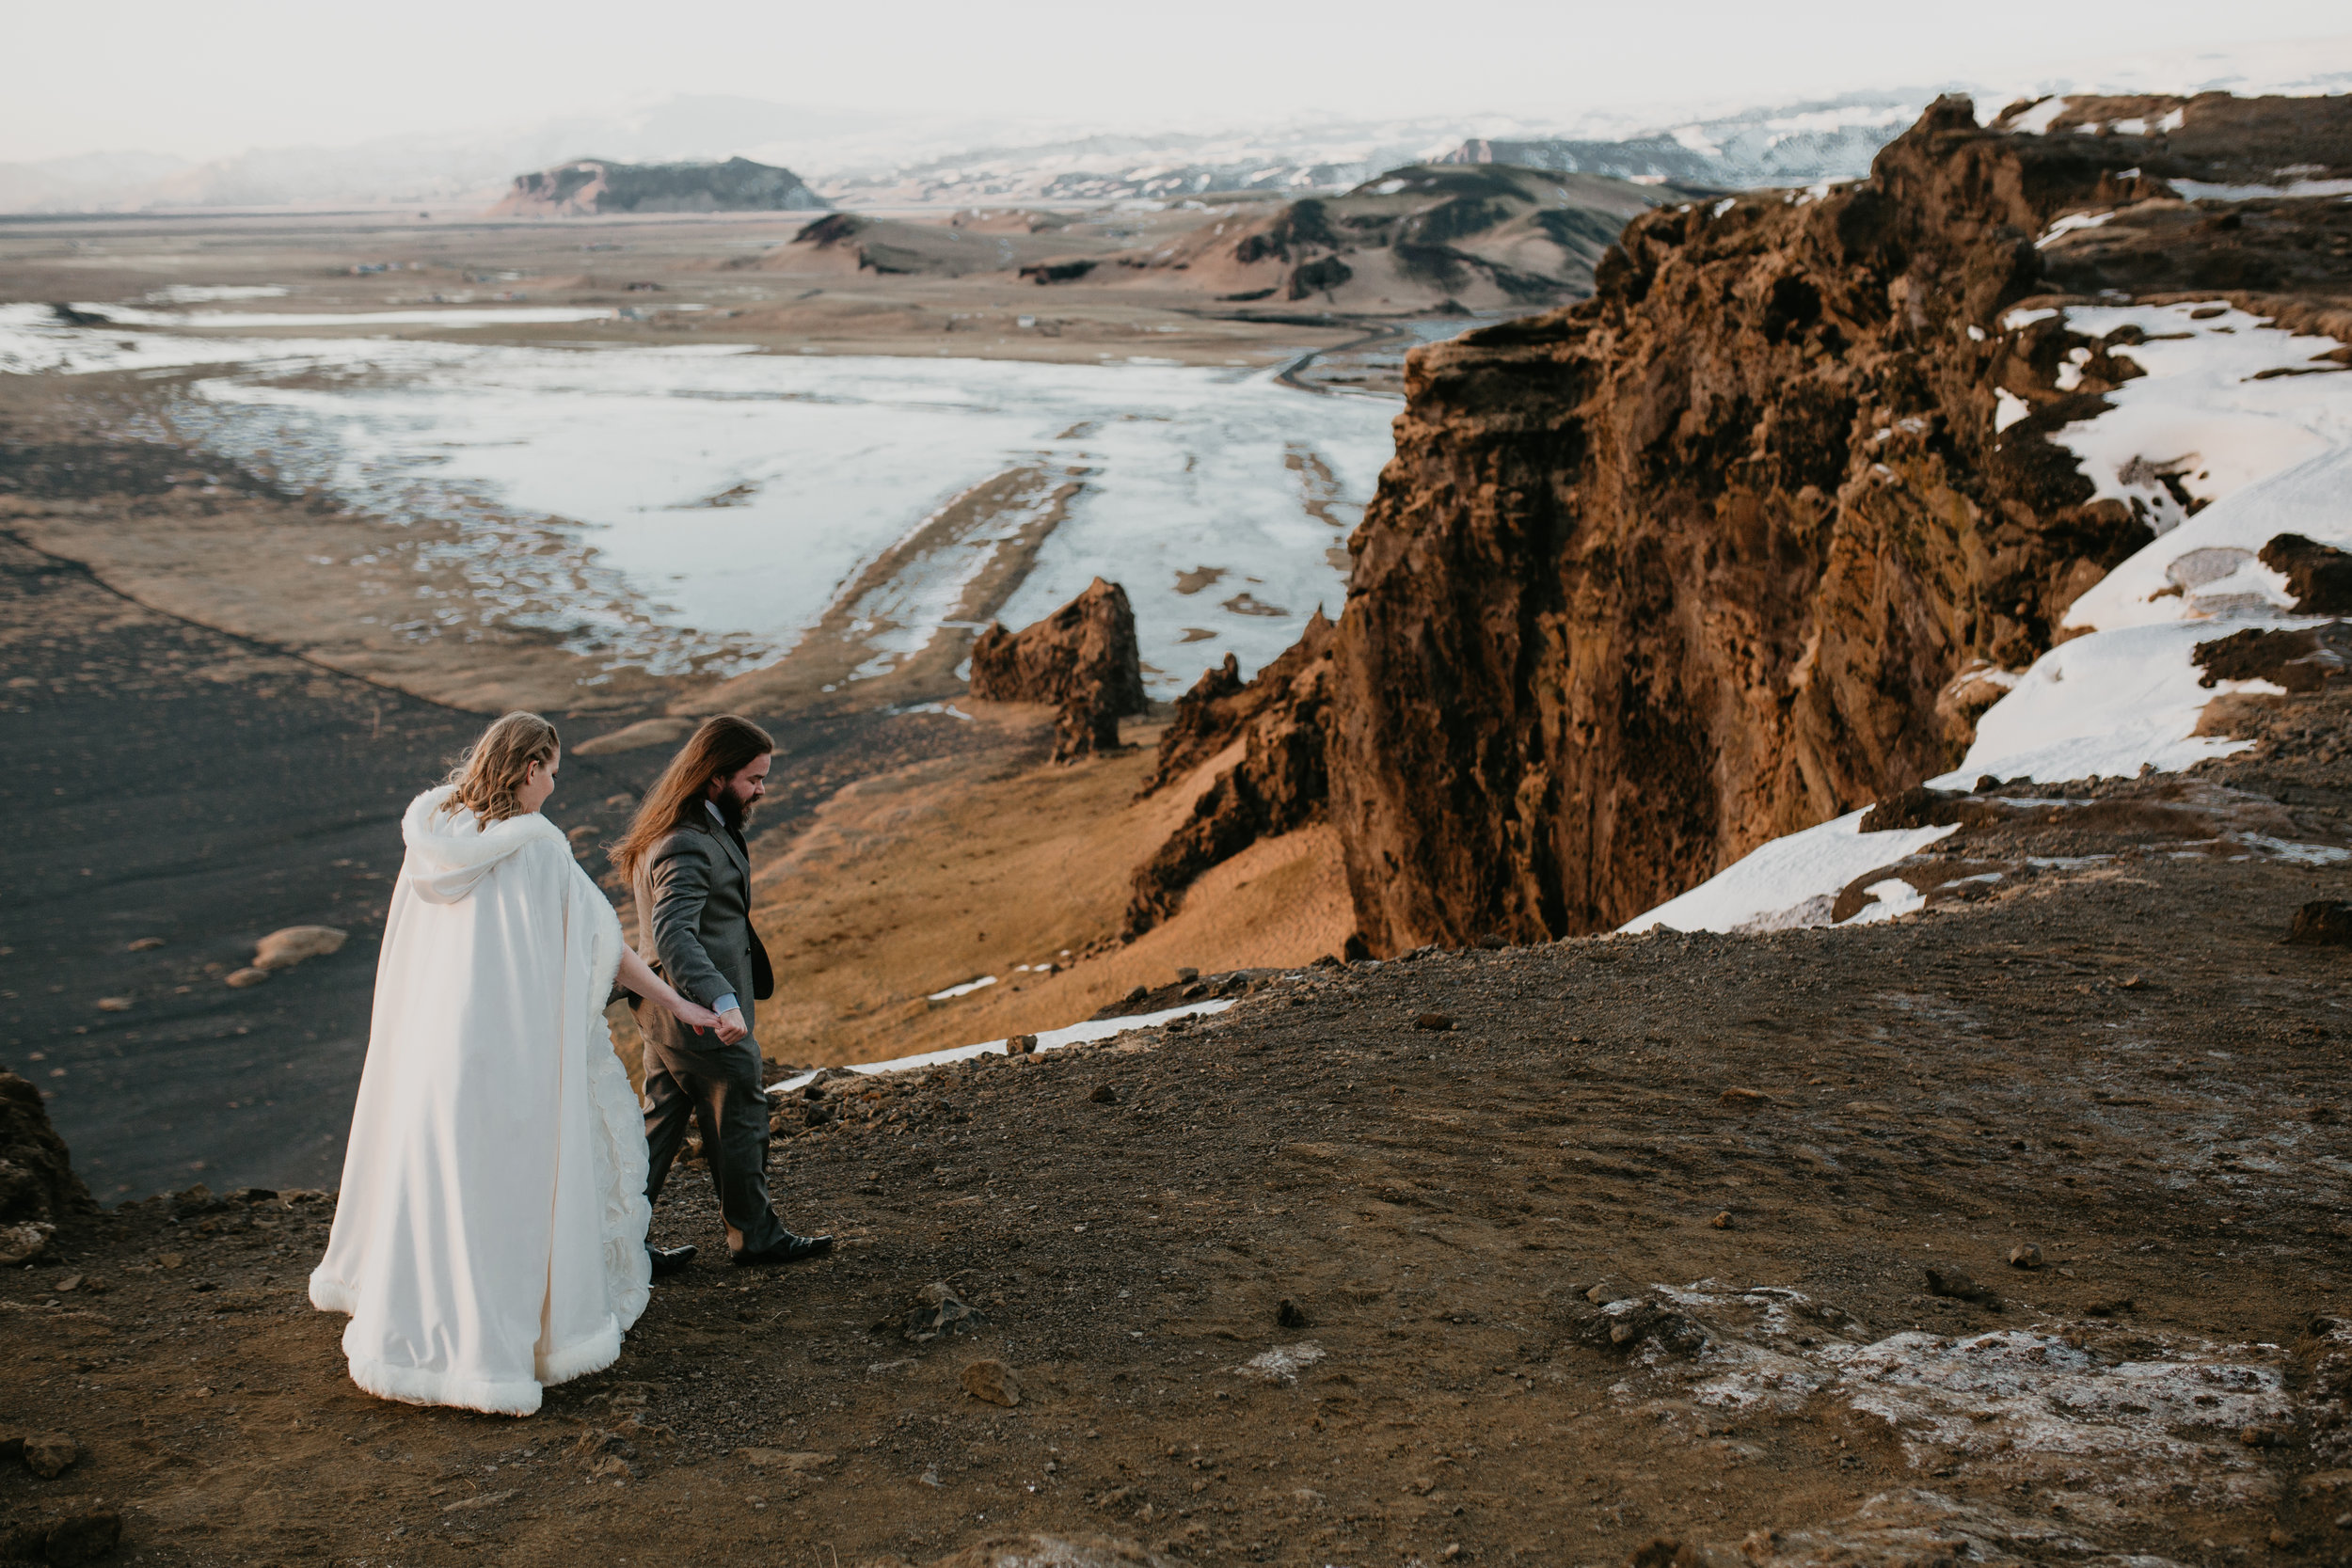 nicole-daacke-photography-iceland-winter-sunset-adventure-elopement-skogafoss-waterfall-black-sand-beach-dyrholaey-vik-iceland-intimate-wedding-black-church-elopement-photographer-44.jpg